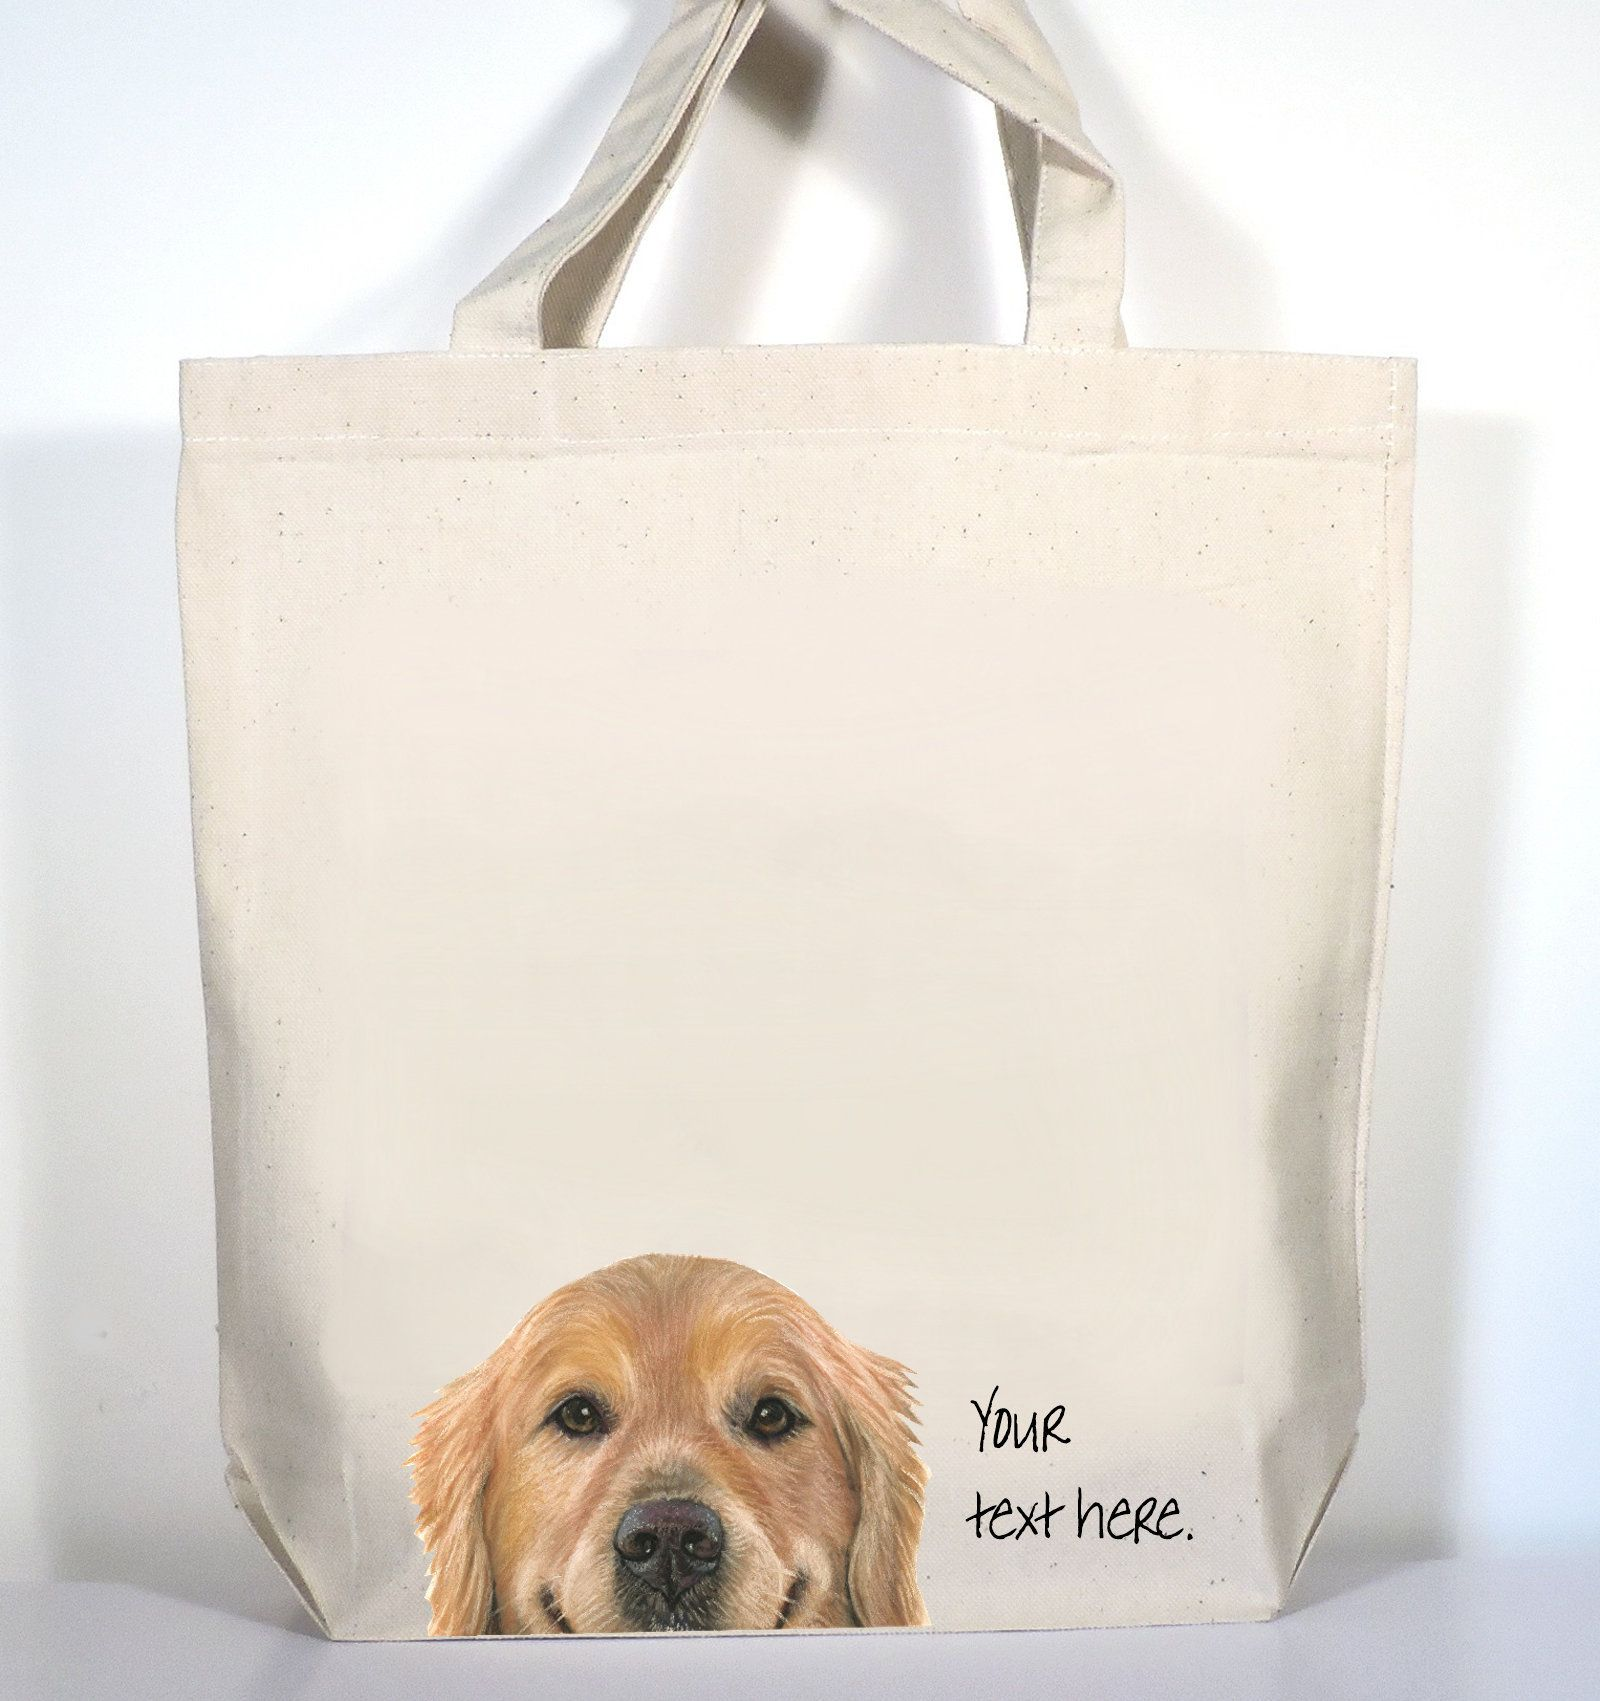 Golden Retriever Tote Golden Retriever Gift Golden Retriever Etsy Golden Retriever Gifts Gifts For Pet Lovers Tote